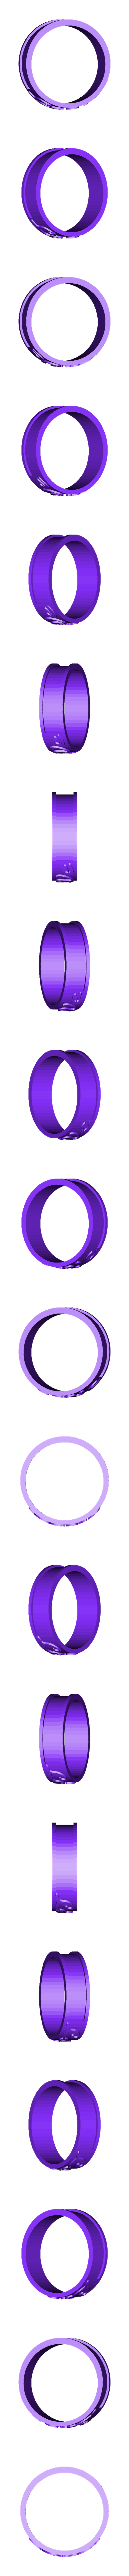 anillo love 22 cerrado hendidura 2.stl Télécharger fichier STL gratuit Anillo / Ring Love • Design pour impression 3D, amg3D